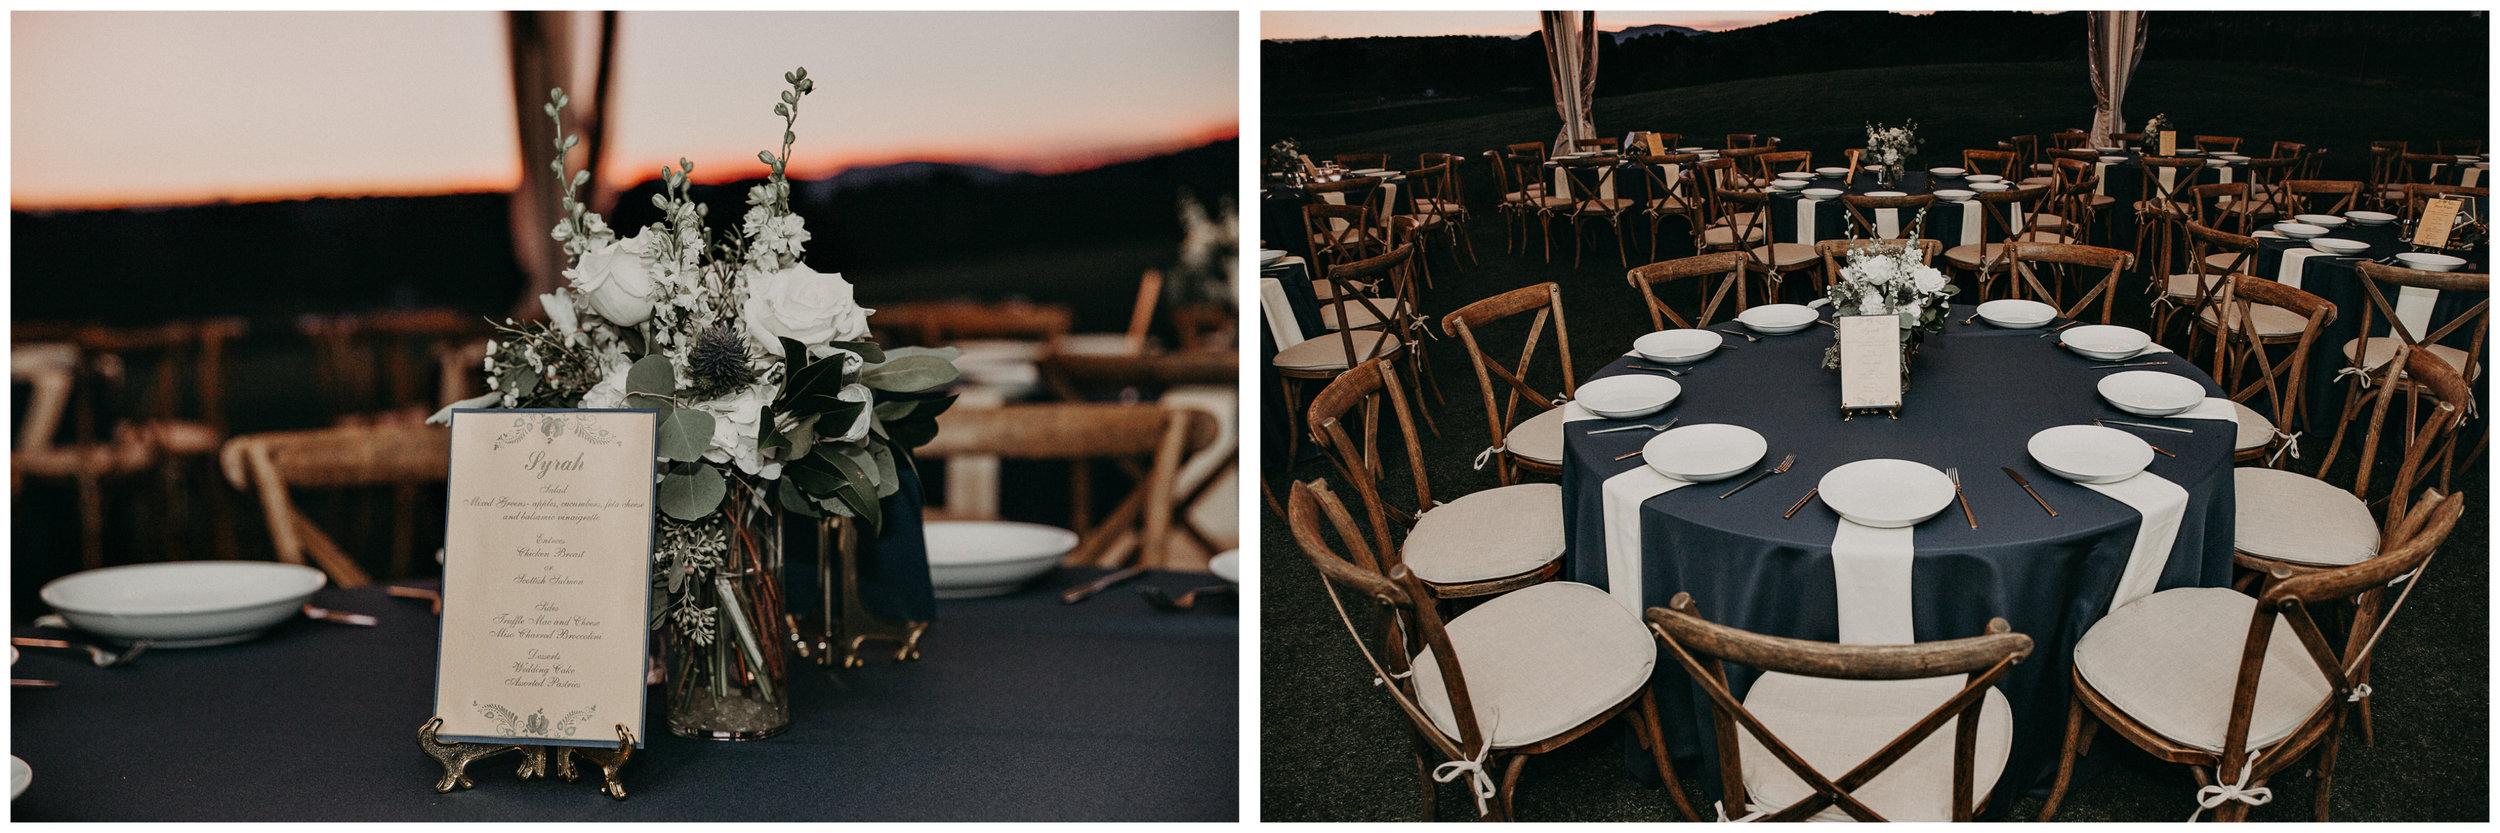 85- Kaya_vineyard_dahlonega_wedding_venue_detais_sunset_aline_marin_photography.jpg